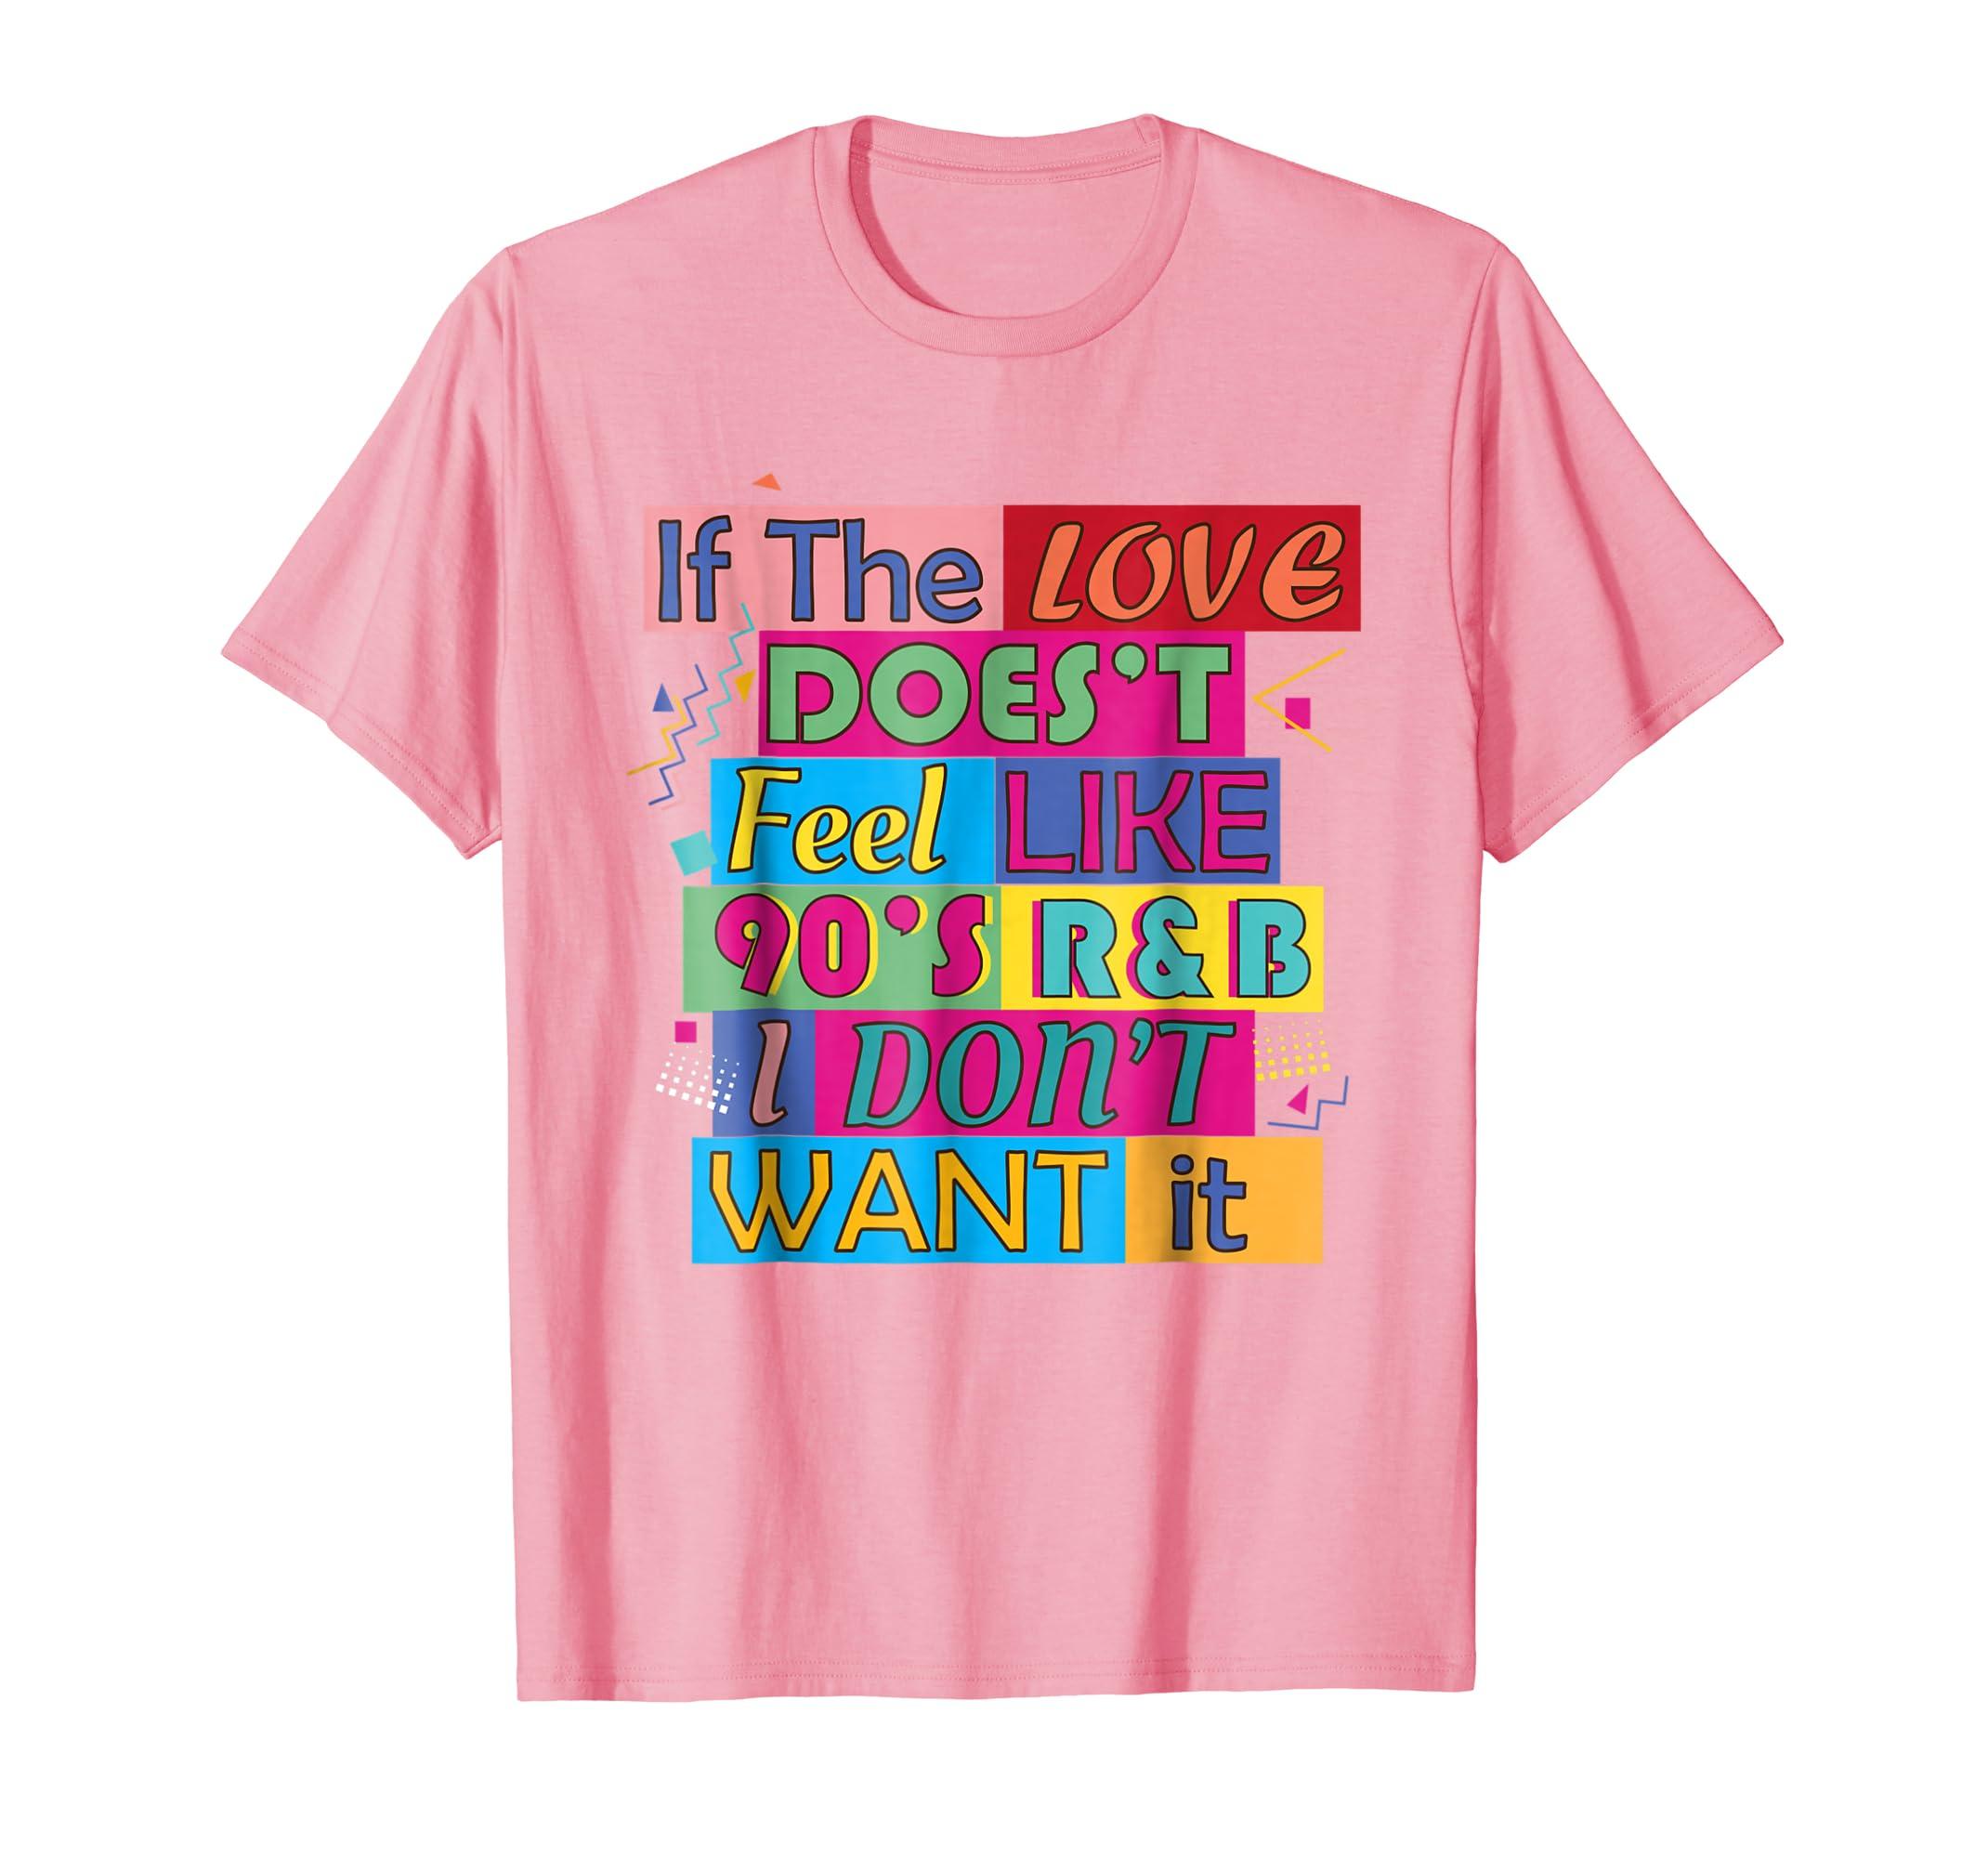 193a023496a0e If The Love Doesnt Feel Like 90s R B I Don t Want It T Shirt ...